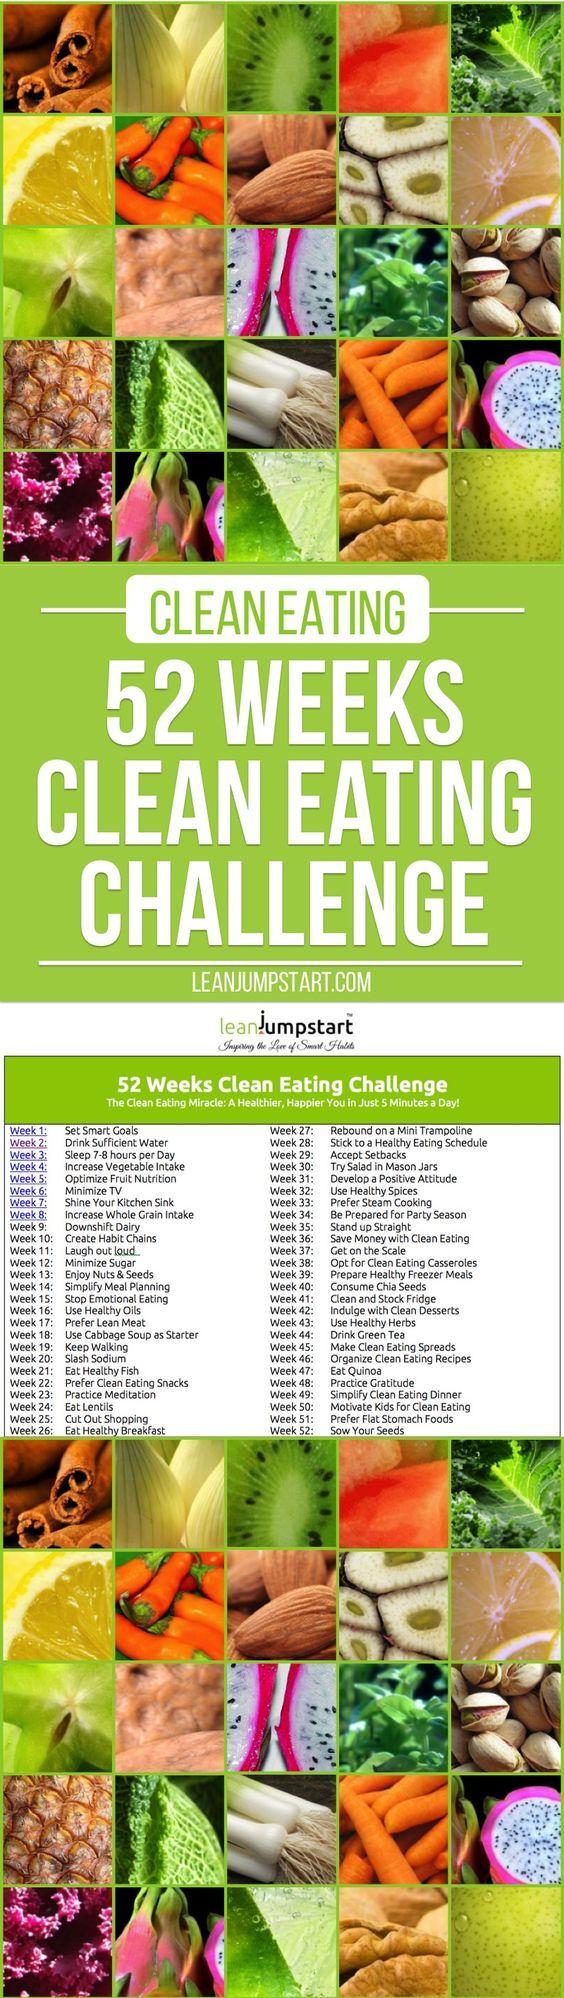 Clean Eating Challenge: 52 Weeks Clean Eating Challenge | Whole-Food Recipes | Healthy Living | Optimal Health